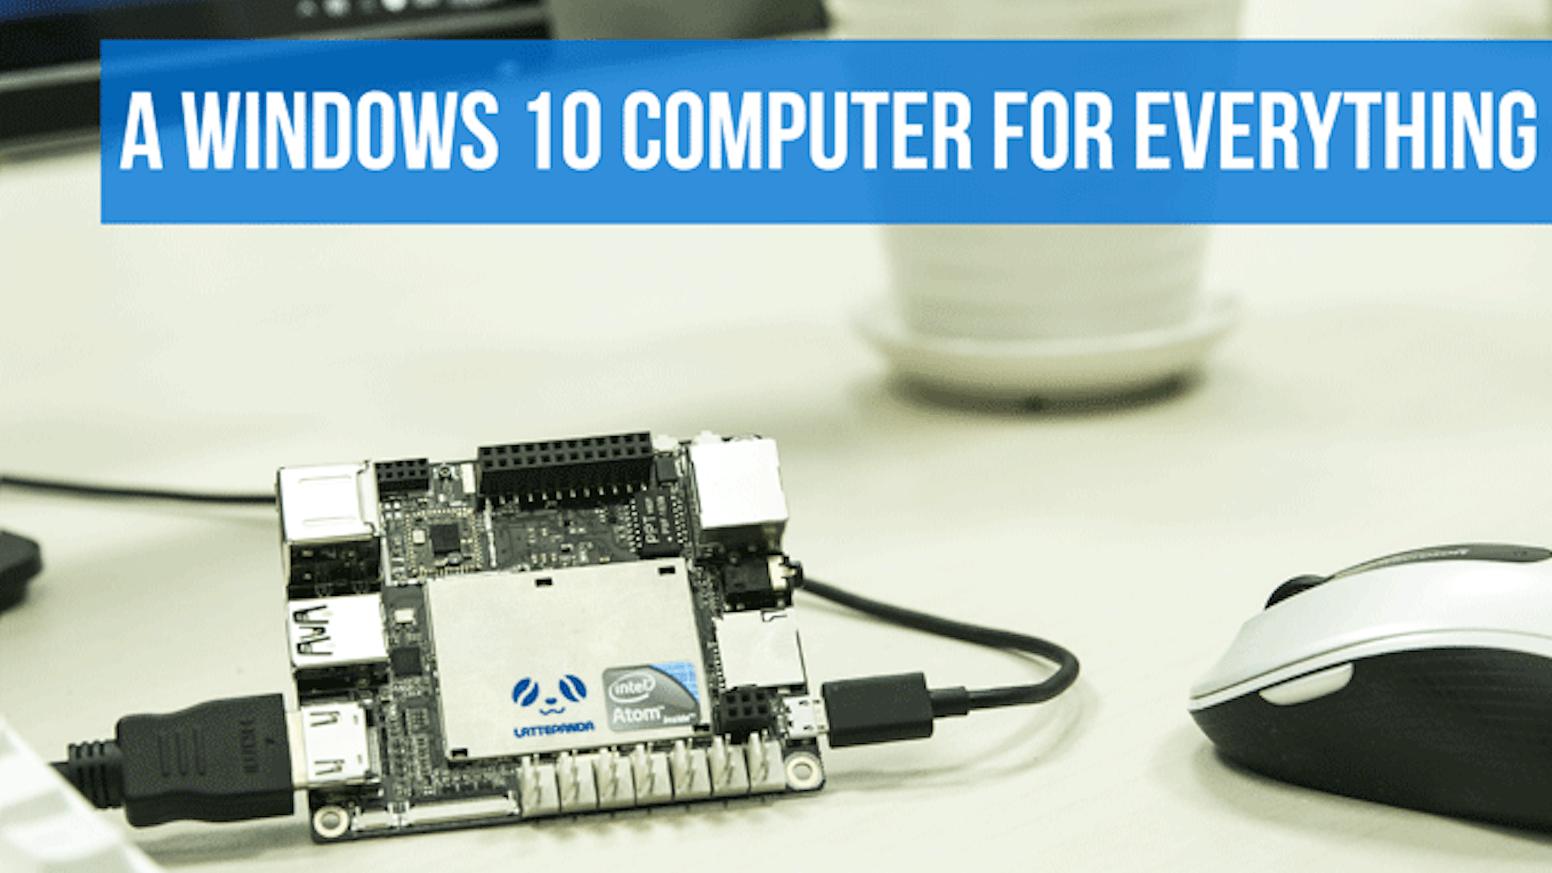 LattePanda features a quad-core 1.8Ghz processor, 2/4GB RAM, 32/64GB eMMC, WiFi, Bluetooth 4.0, USB 3.0 and an onboard Arduino!